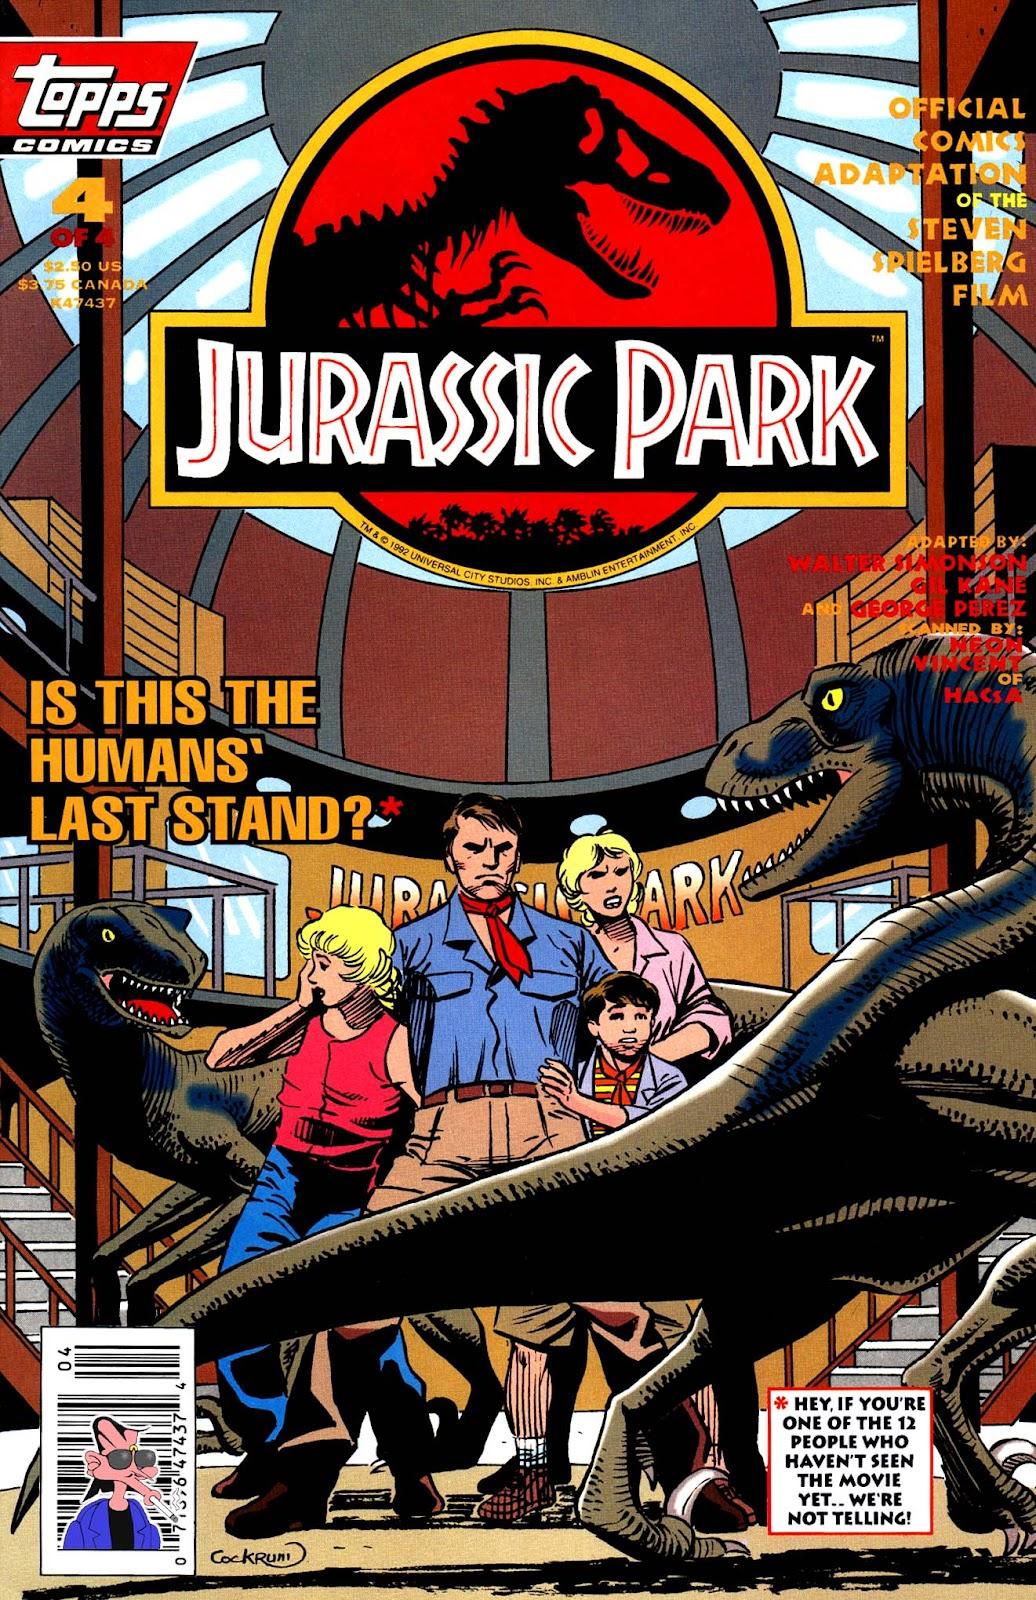 Comic Jurassic Park 1993 Issue 5